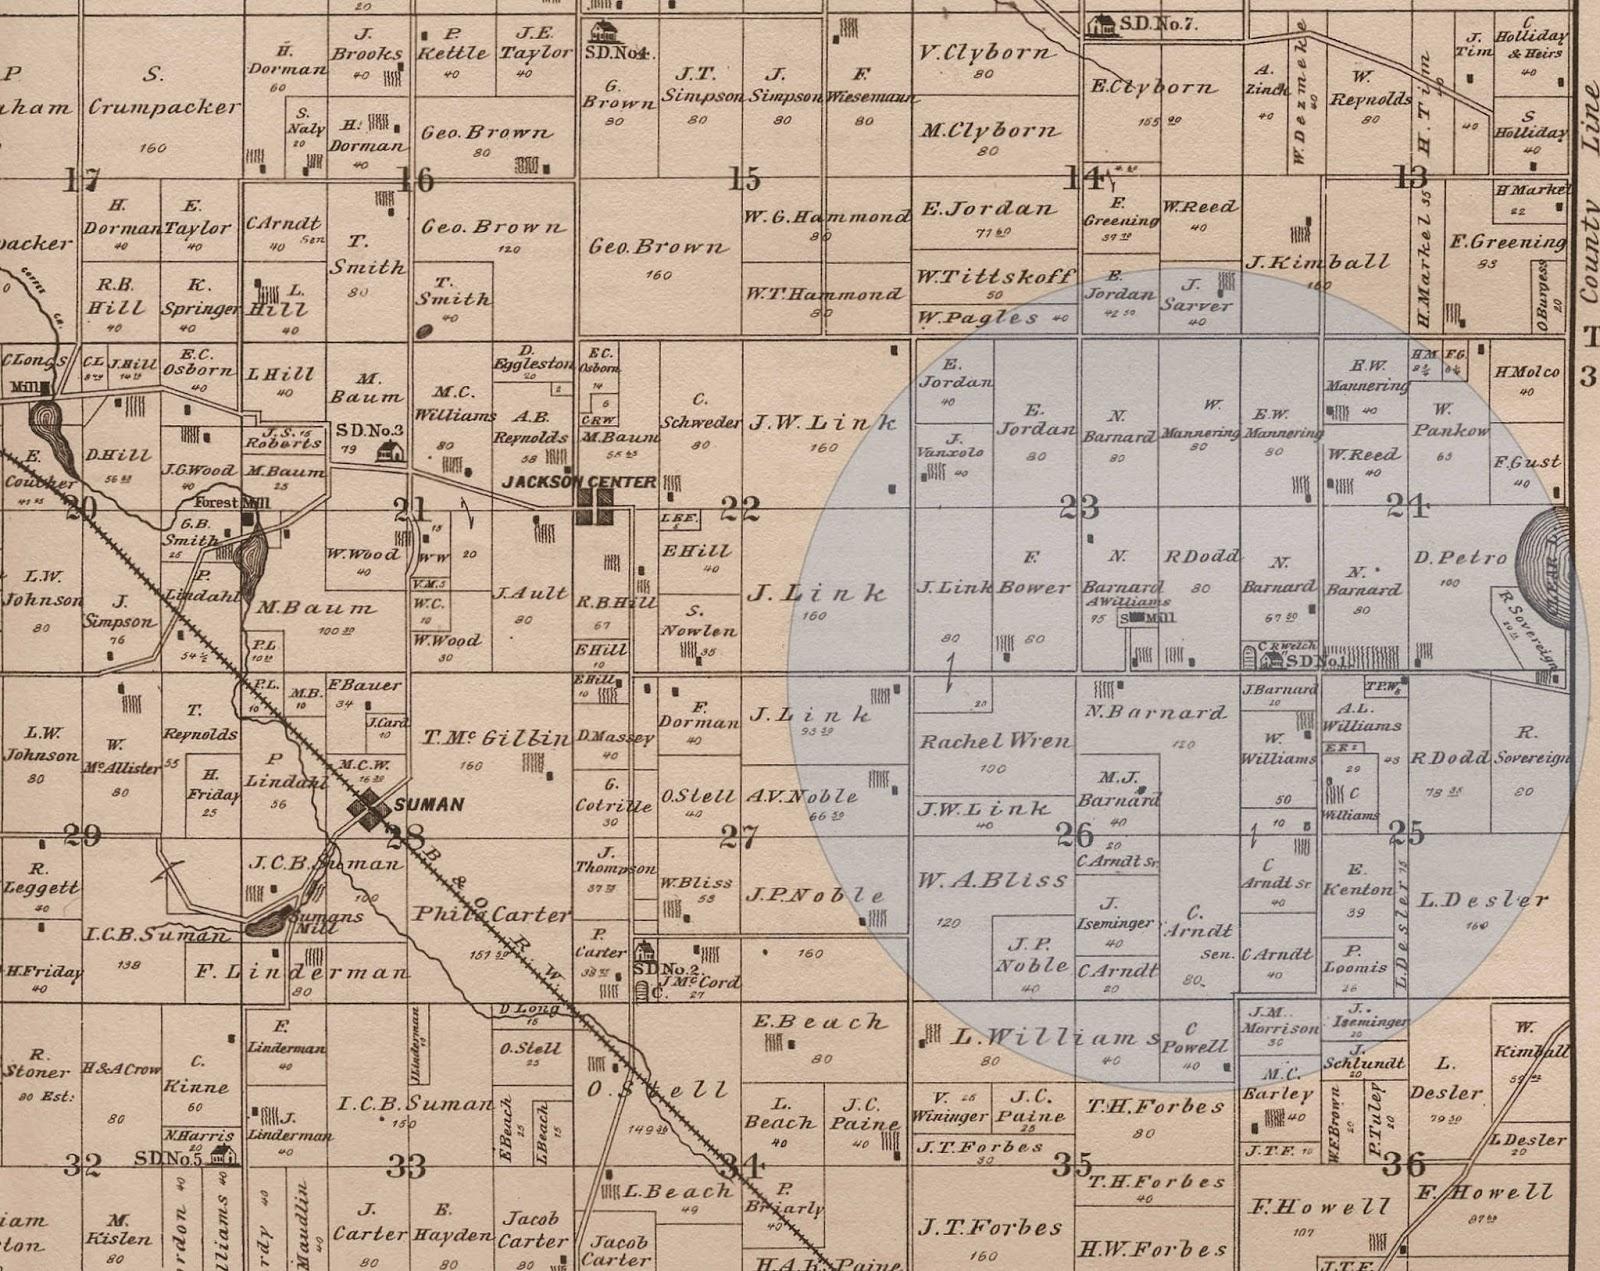 Porter County S Past An Amateur Historian S Perspective Quakerdom